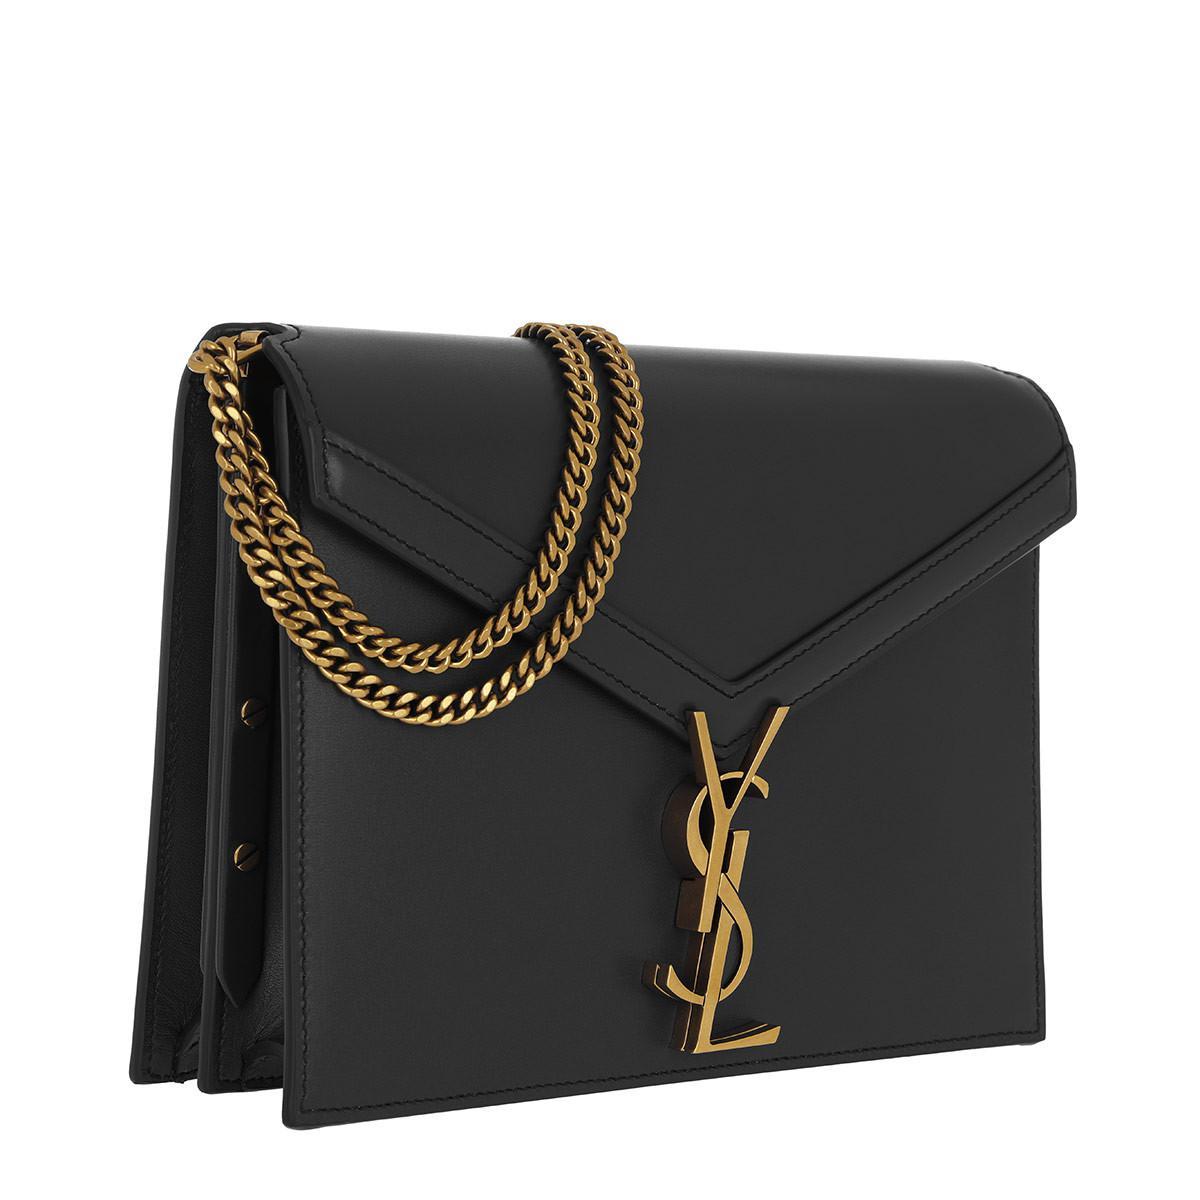 Saint Laurent - Cassandra Monogramme Chain Bag Leather Black - Lyst. View  fullscreen 5bcb224ed0a84